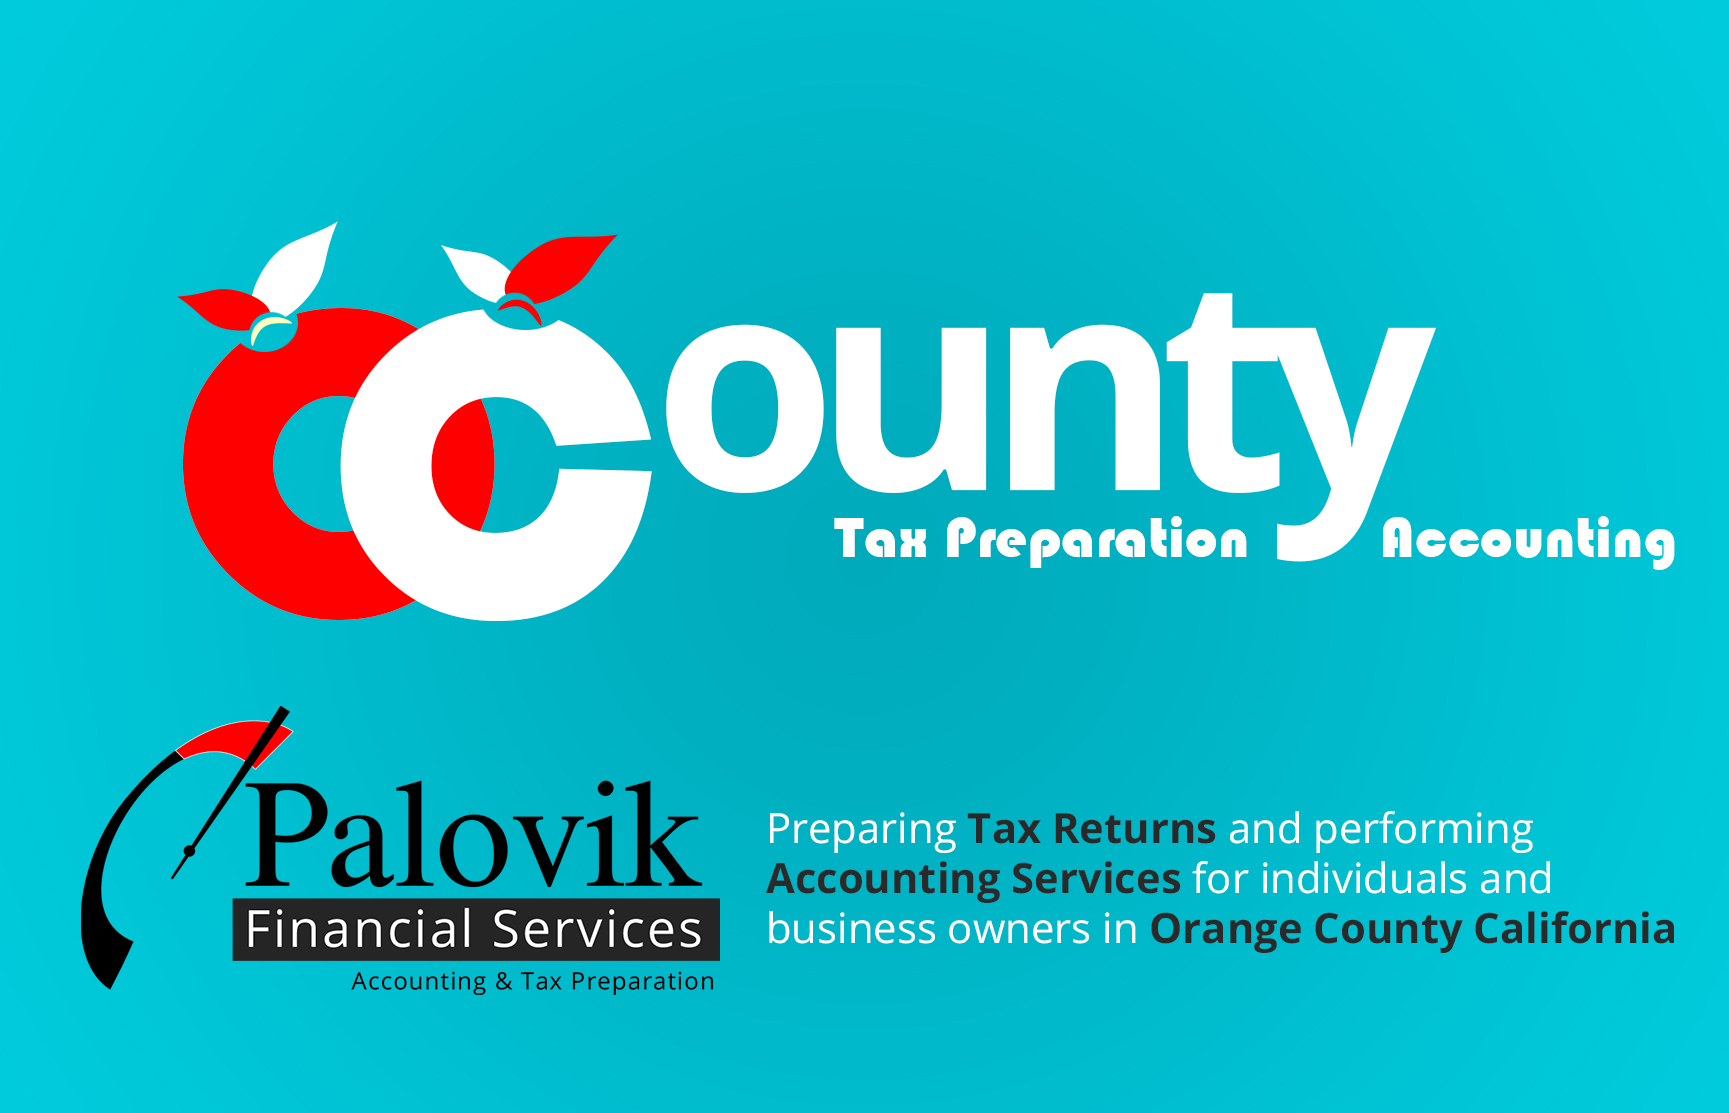 Orange County Accounty Services - Tax Preparers